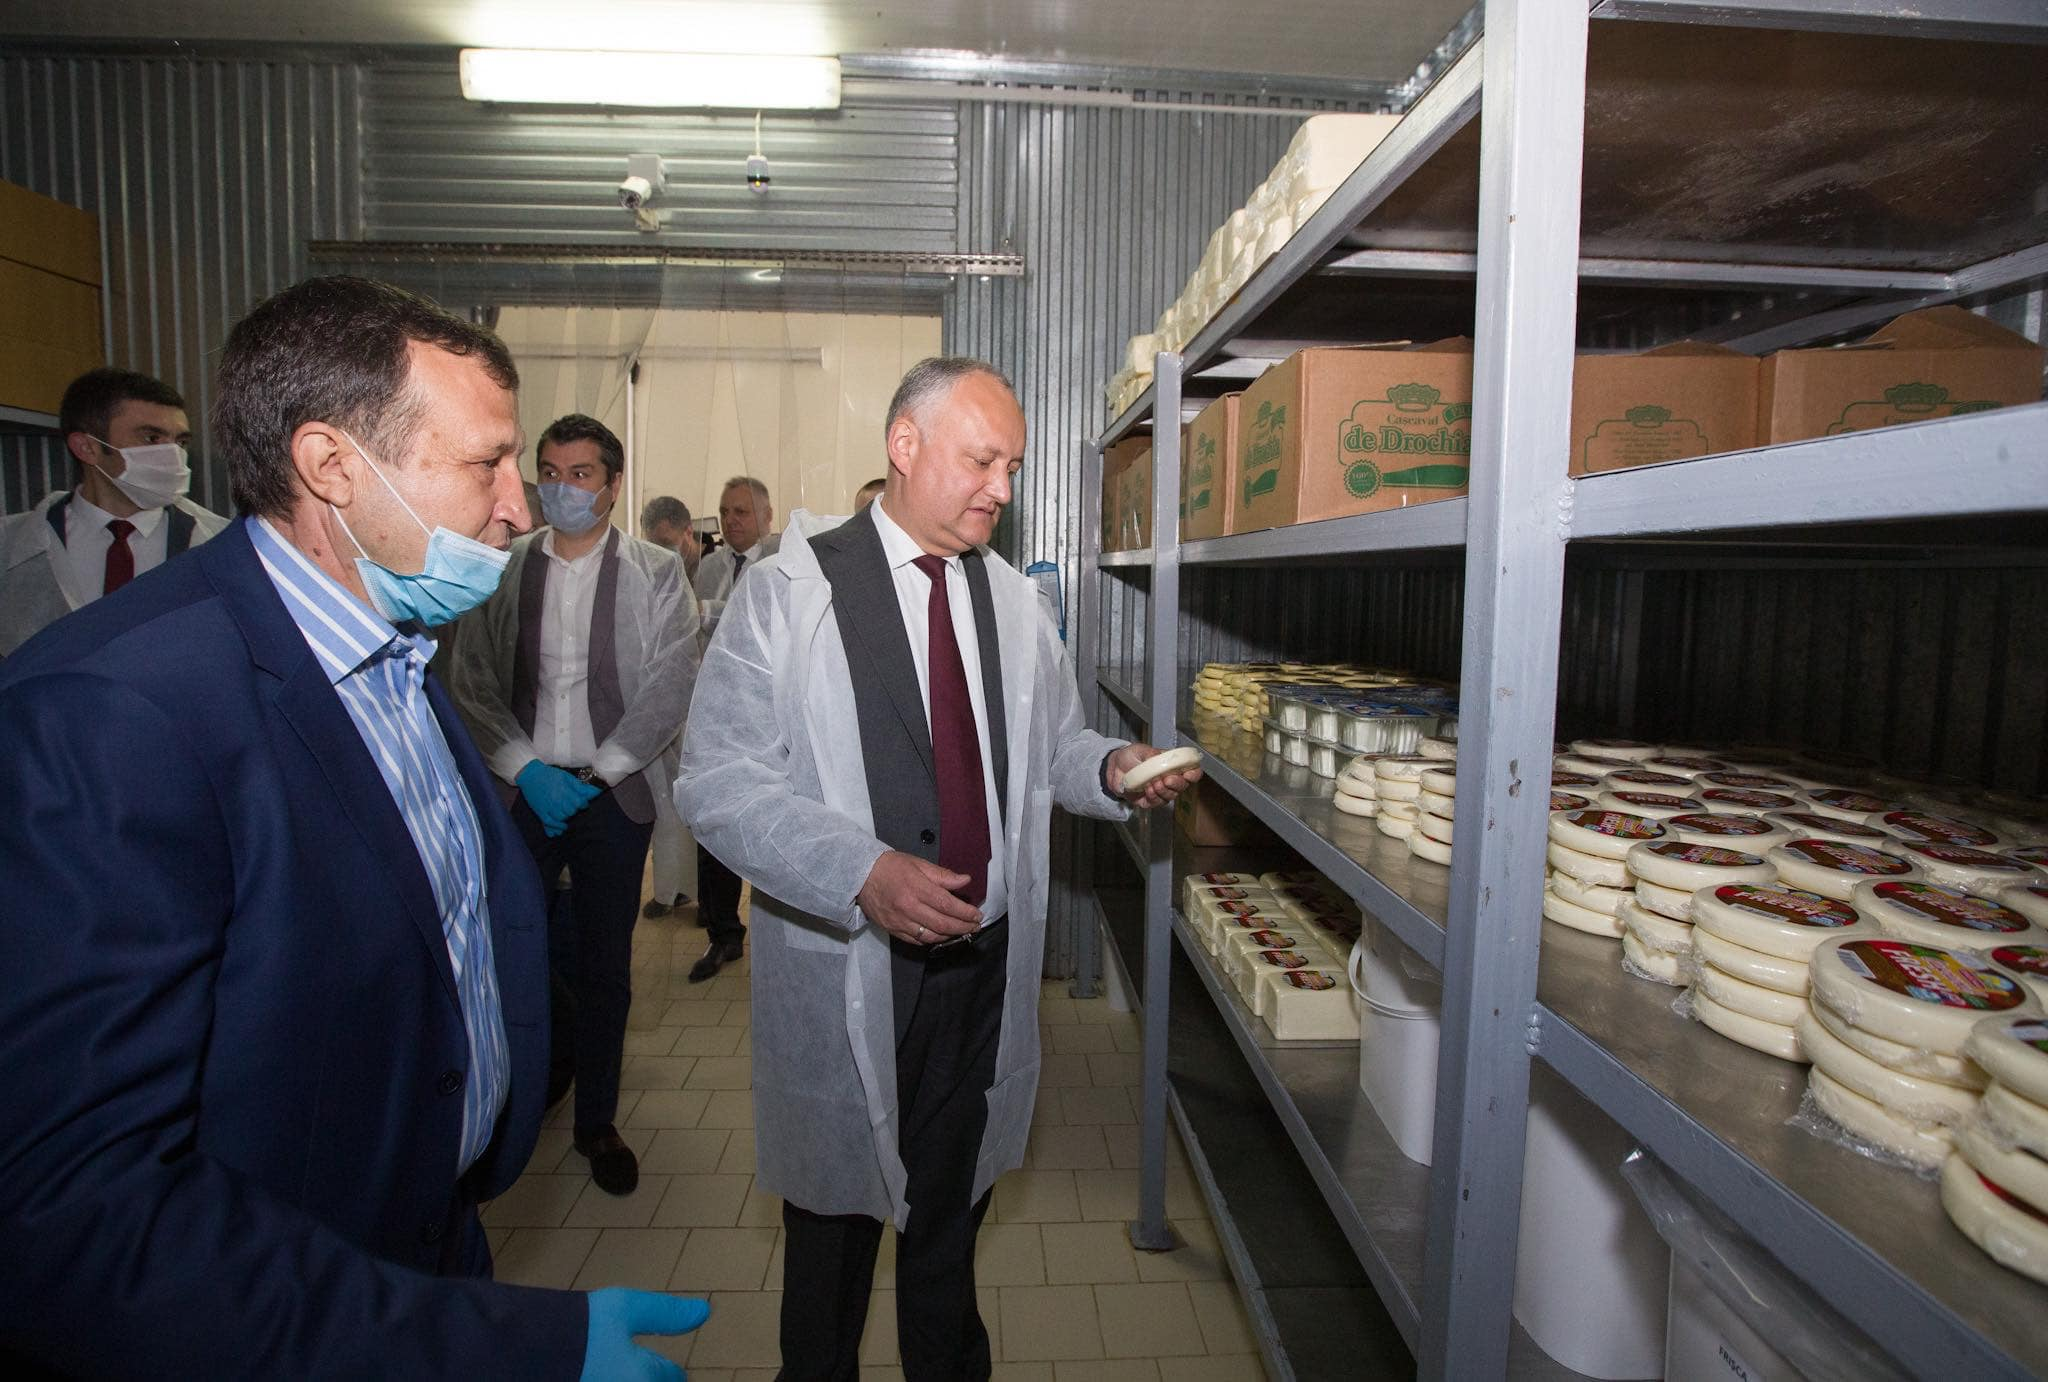 Президент посетил молочный комбинат и сахарный завод в Дрокии (ФОТО, ВИДЕО)